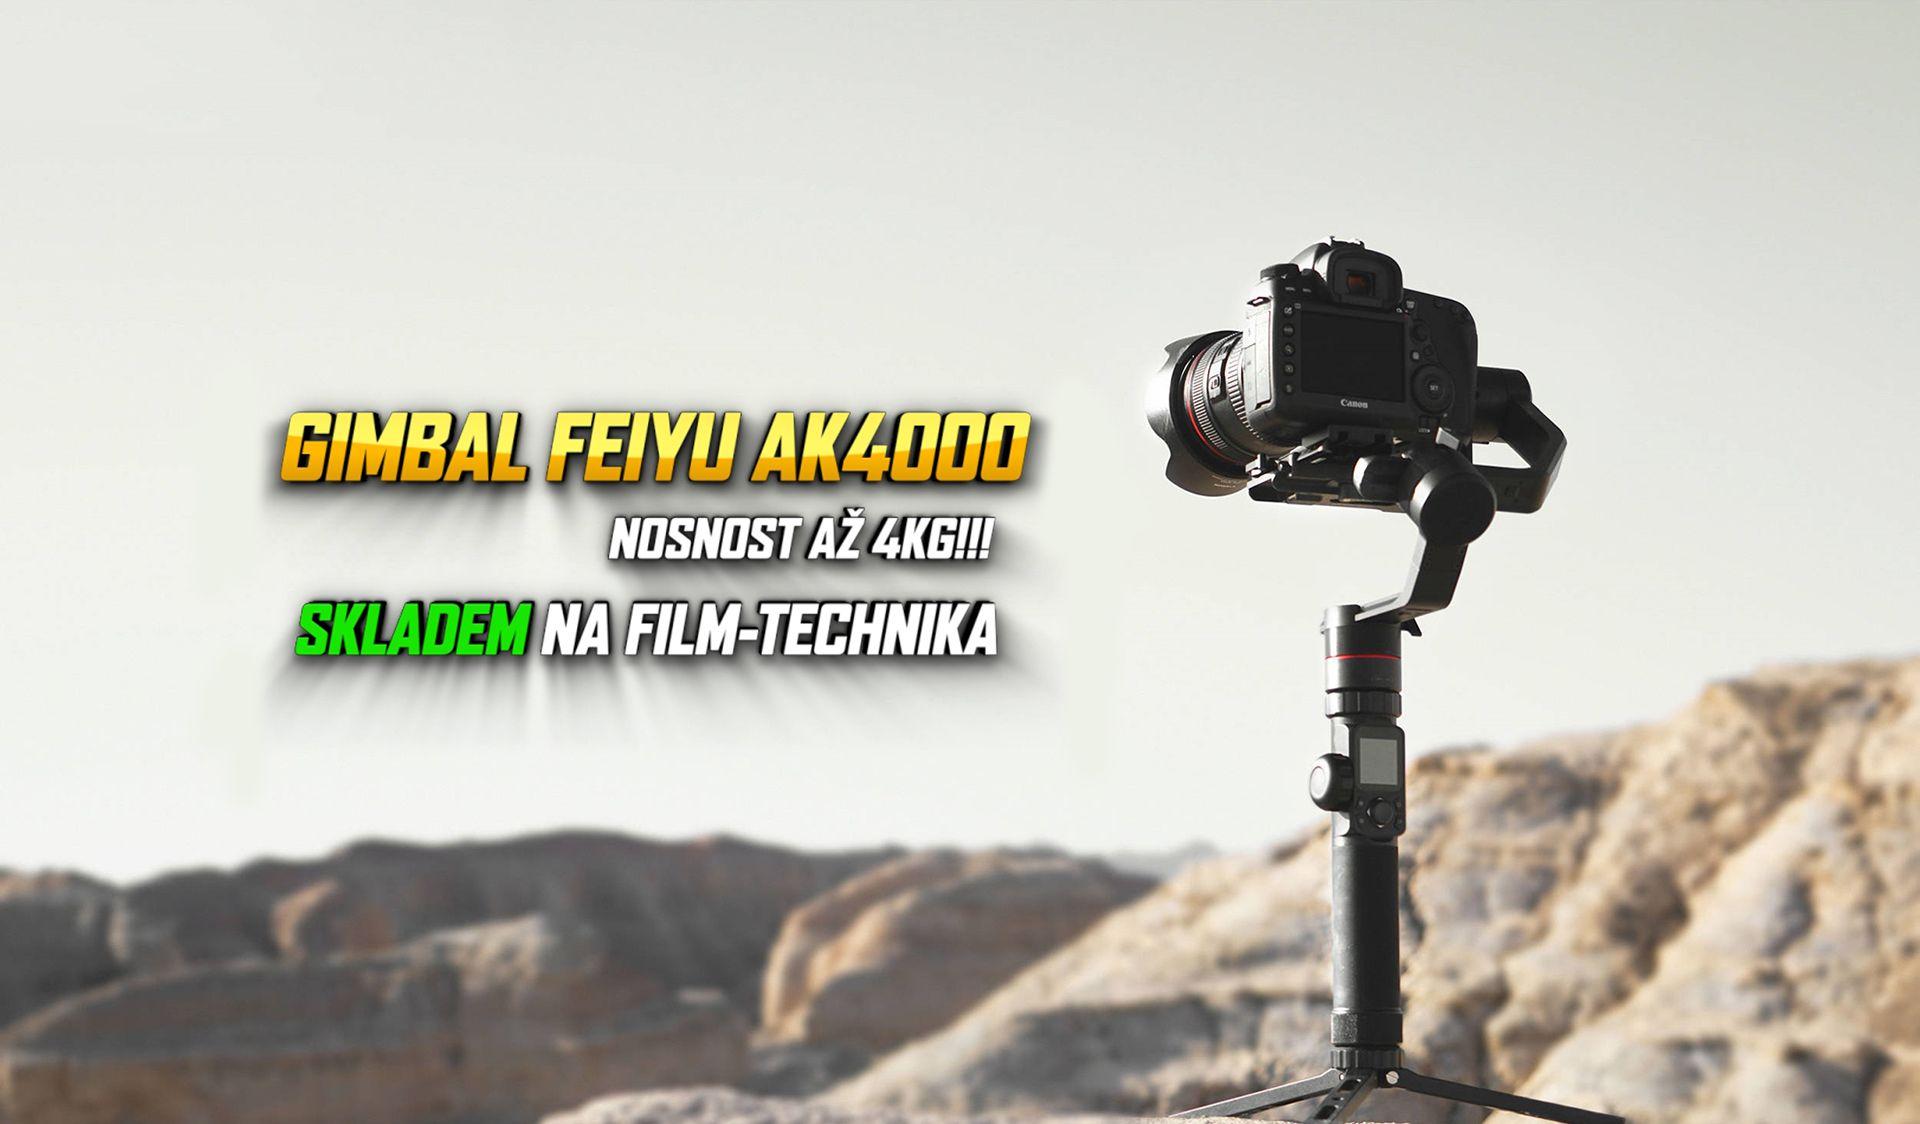 film-technika-feiyu-ak4000-intext1